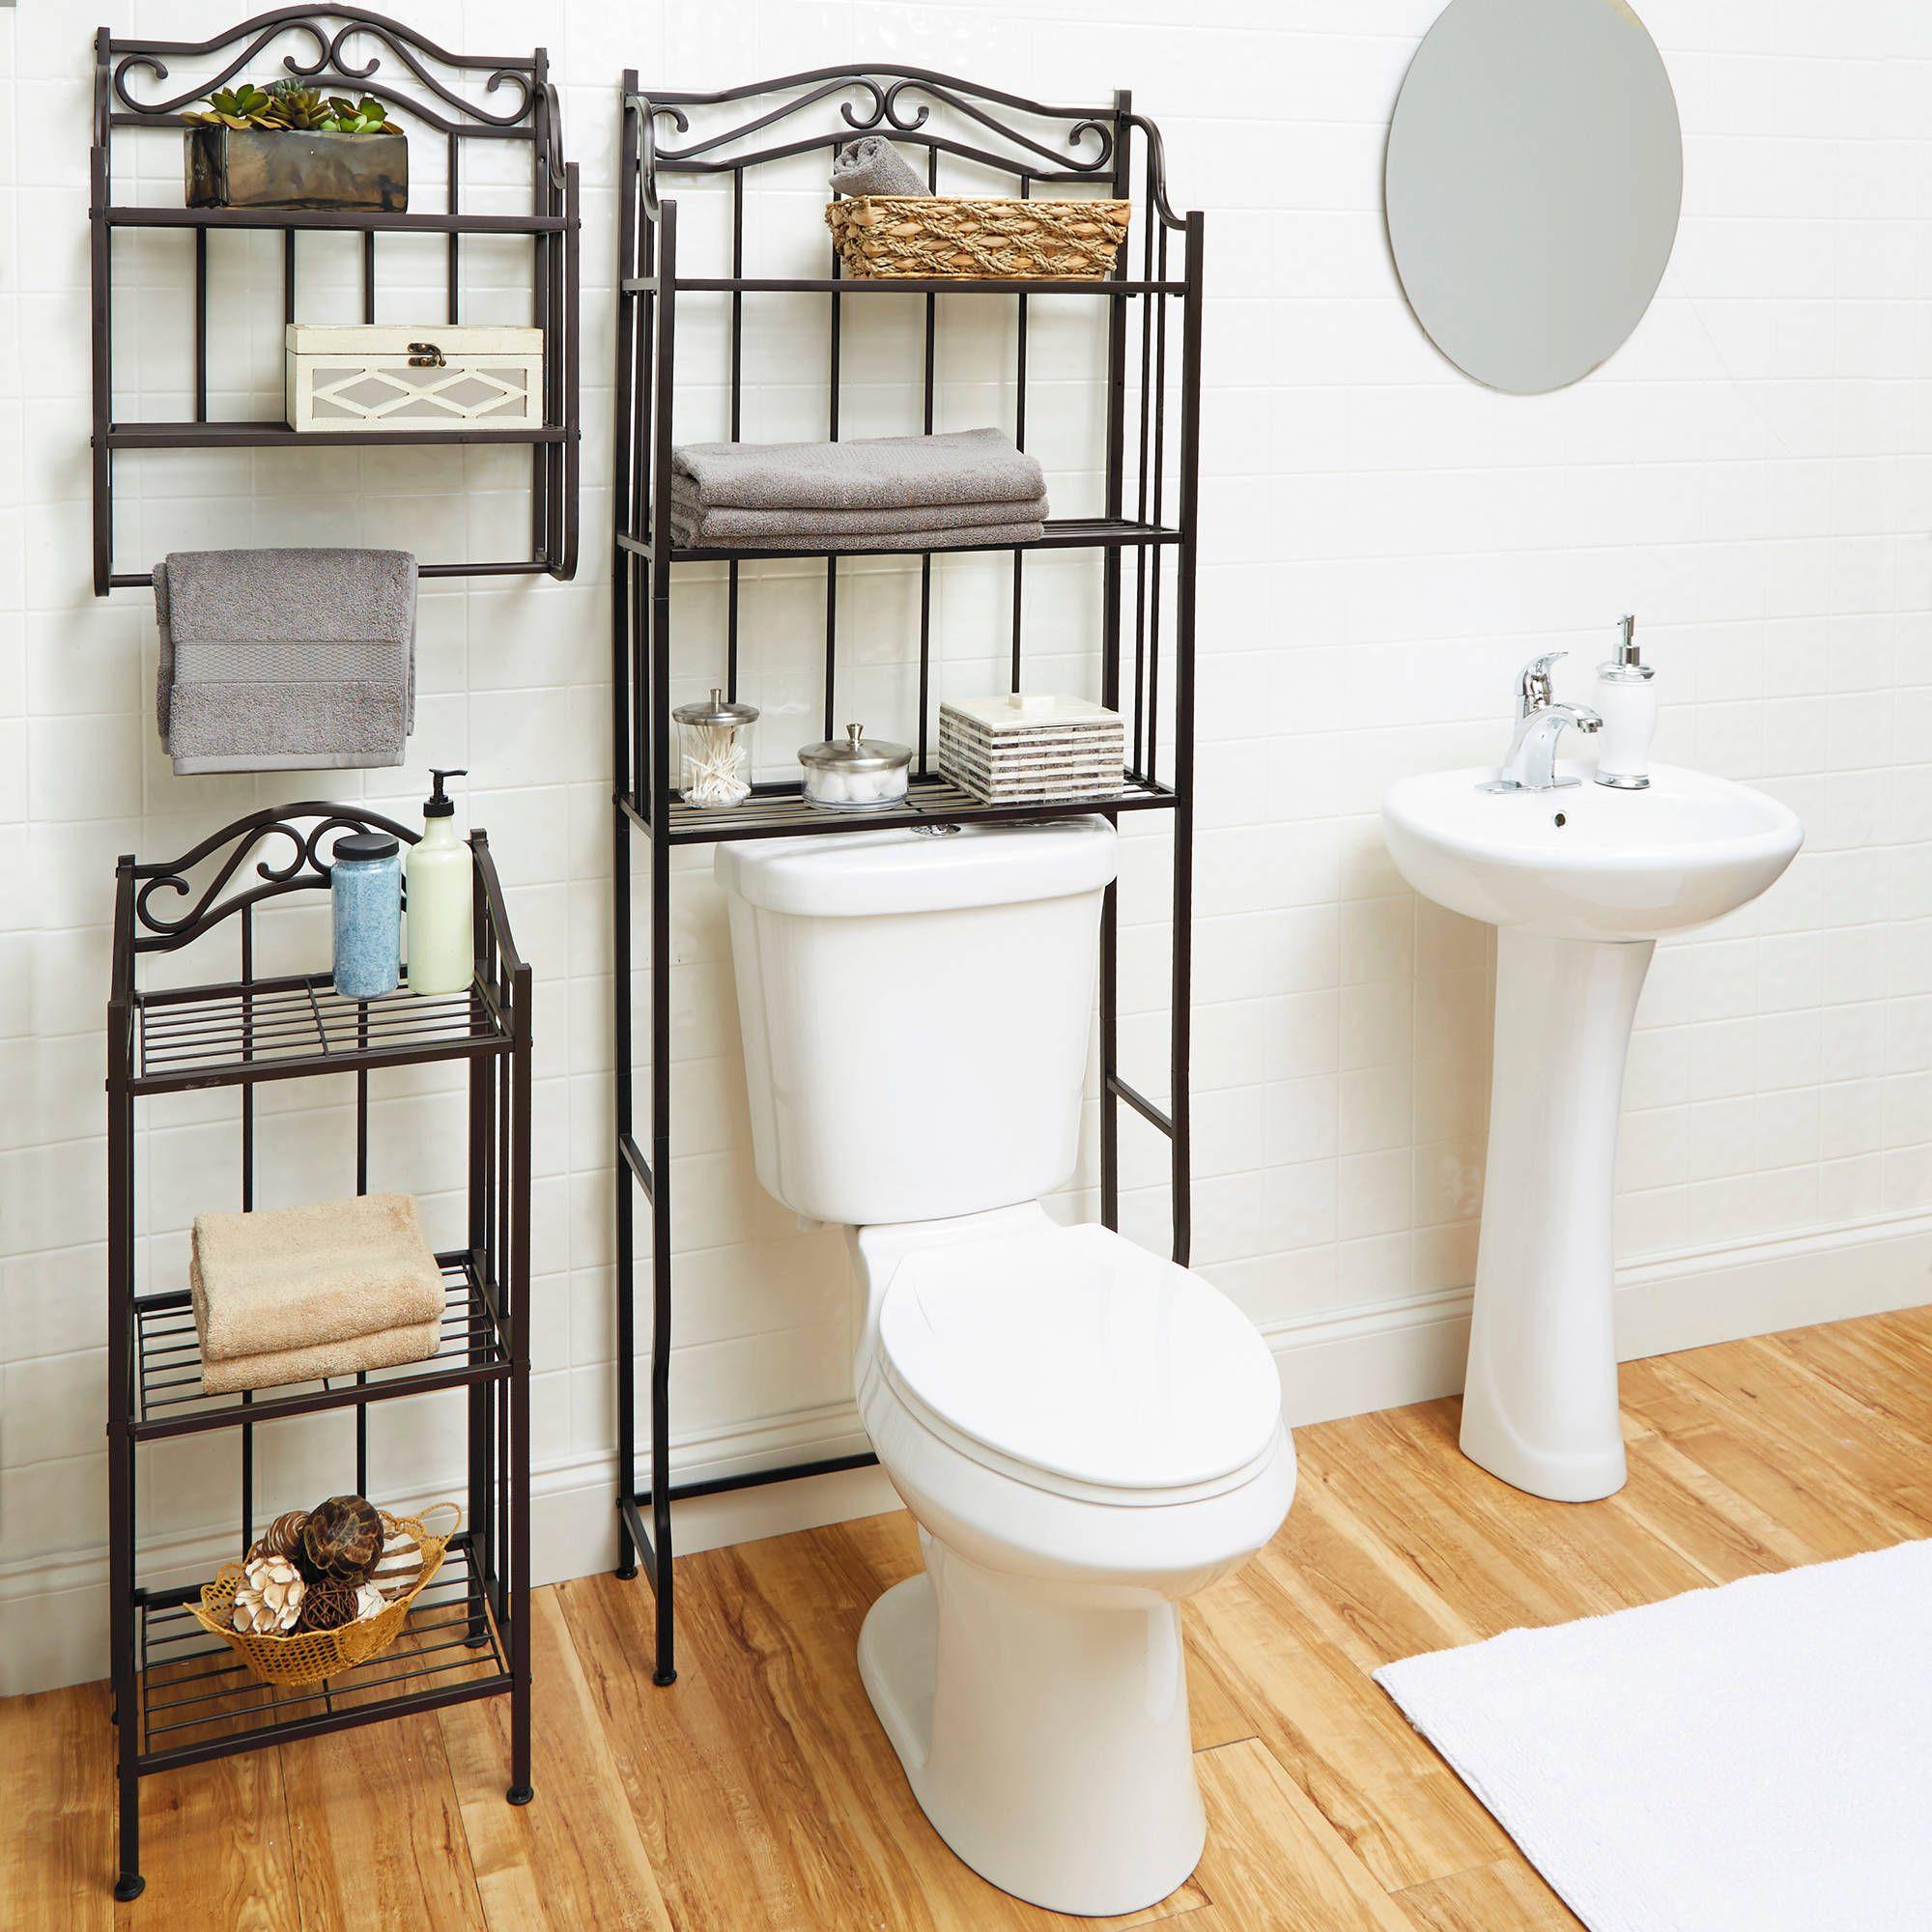 27 Bathroom Shelf Ideas To Keep Your Space Uncluttered Bathroom Floor Storage Bathroom Wall Storage Bathroom Wall Shelves